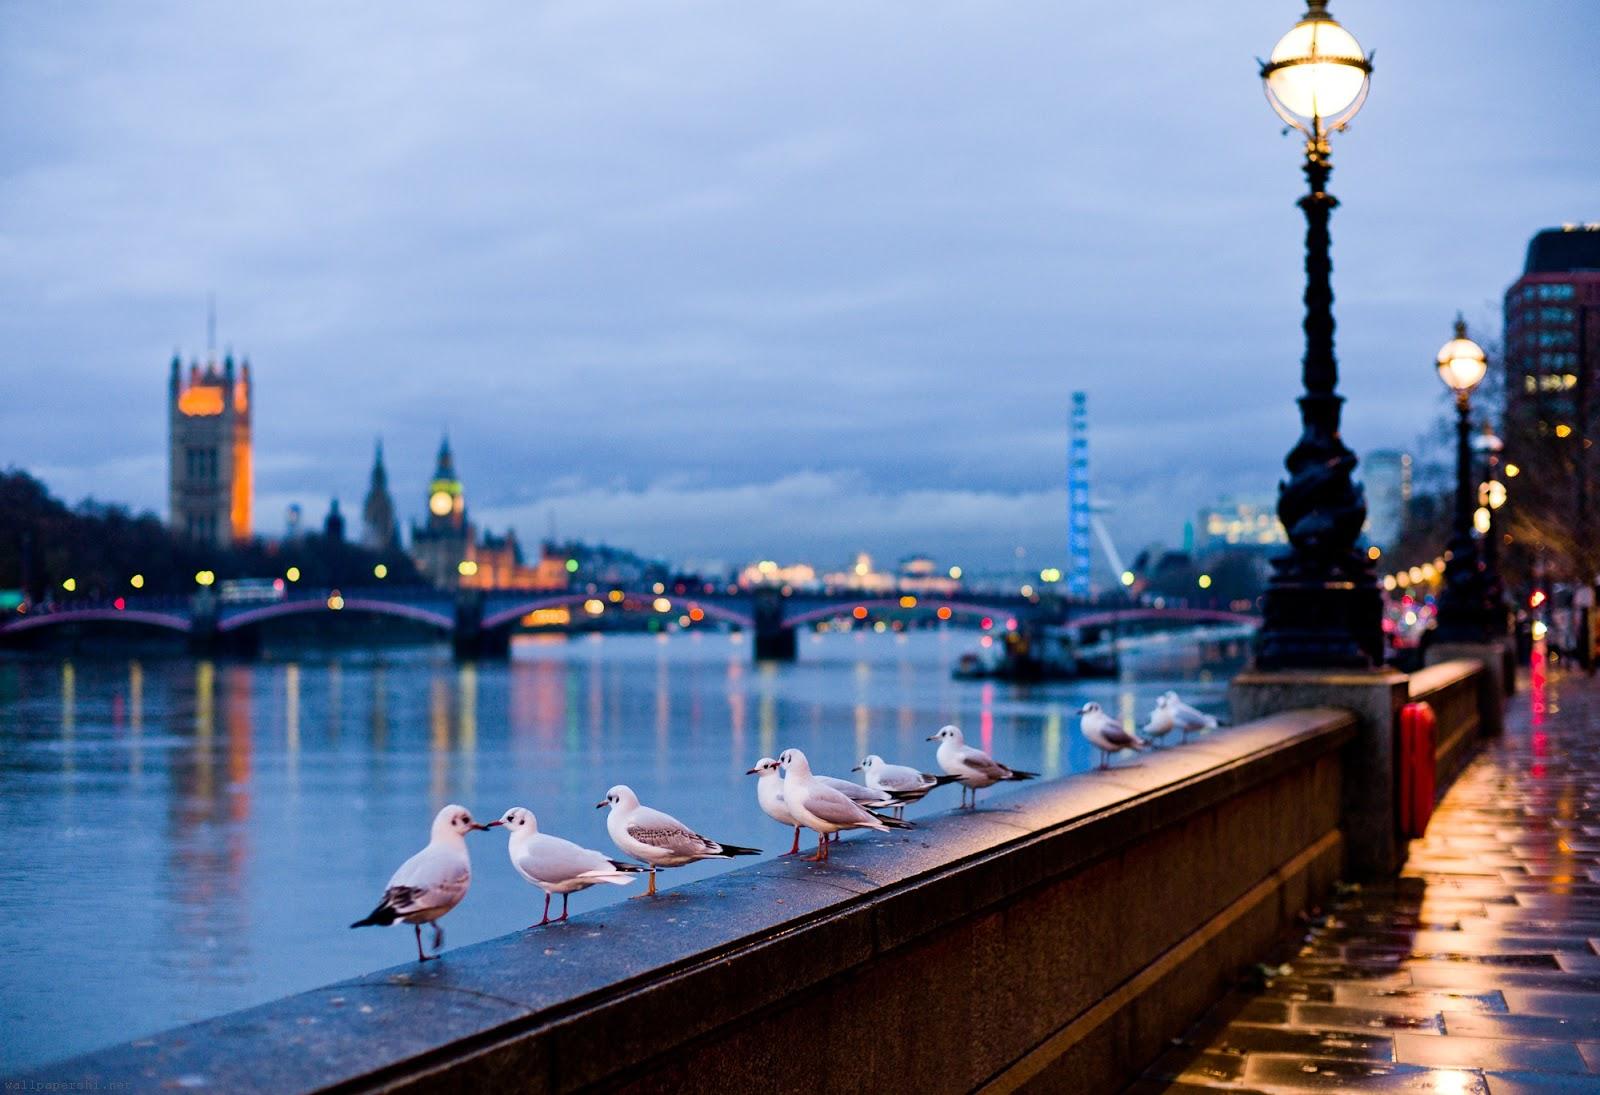 london high resolution - photo #12